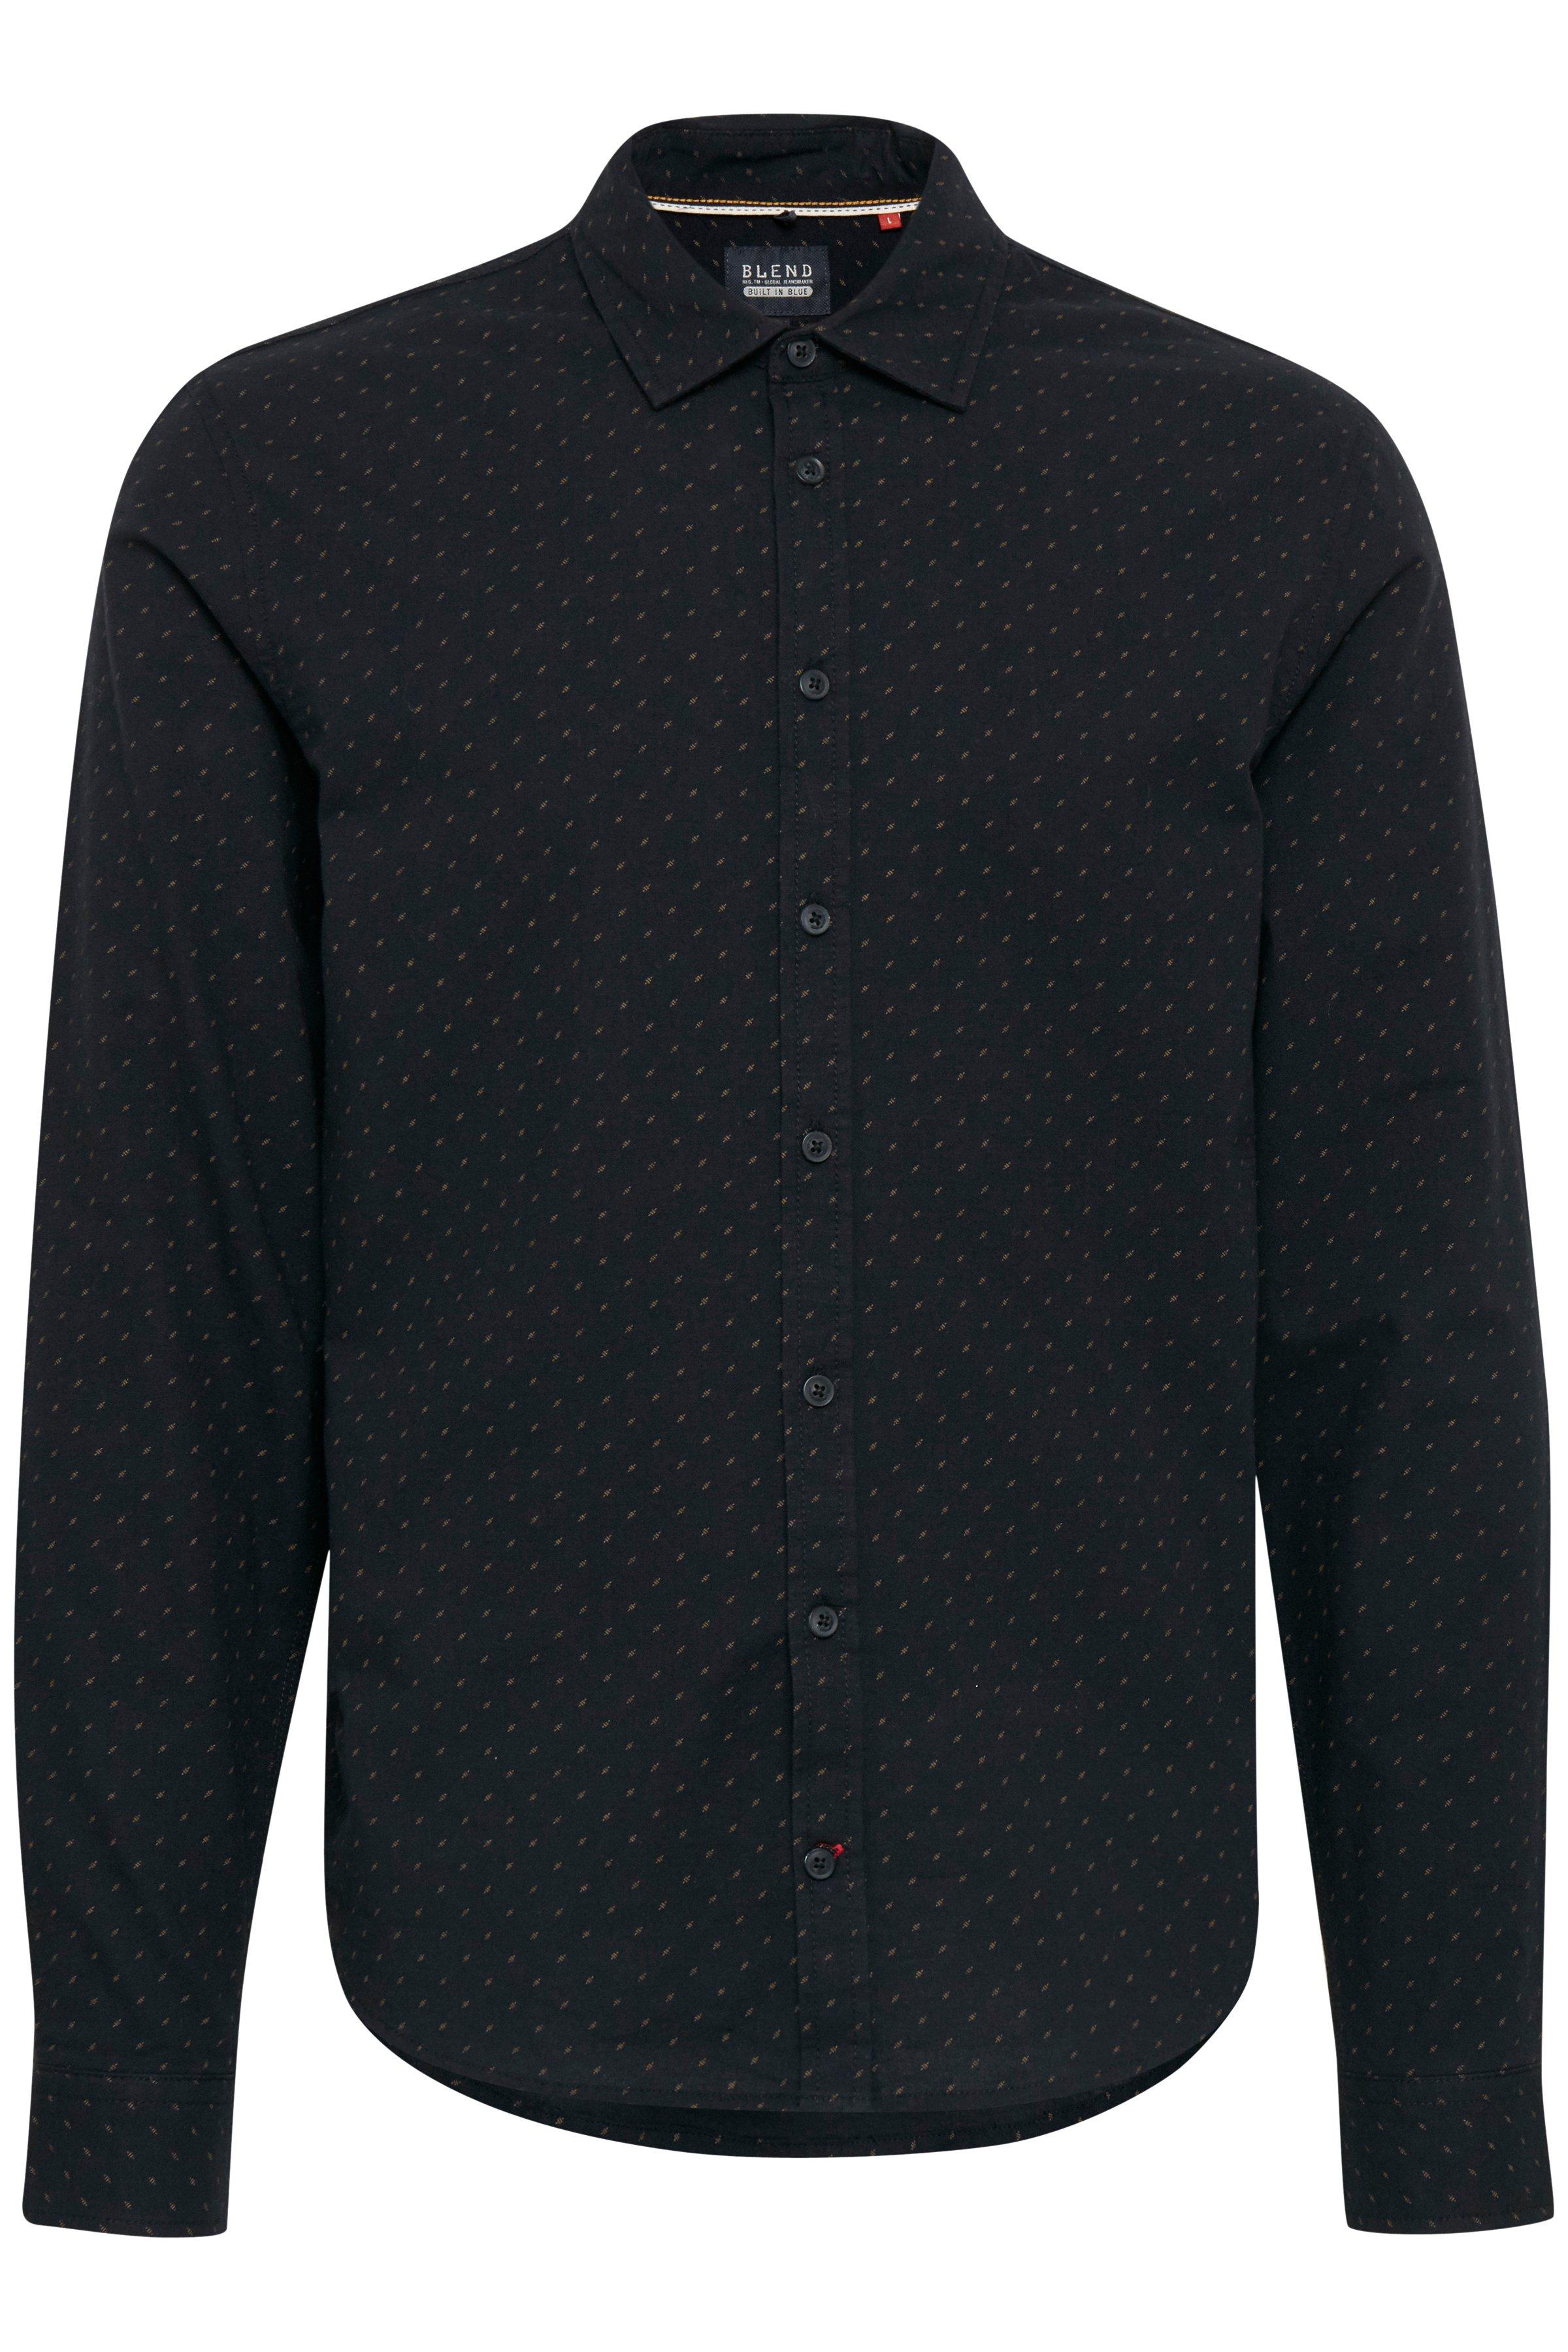 Black Langærmet skjorte – Køb Black Langærmet skjorte fra str. S-XXL her